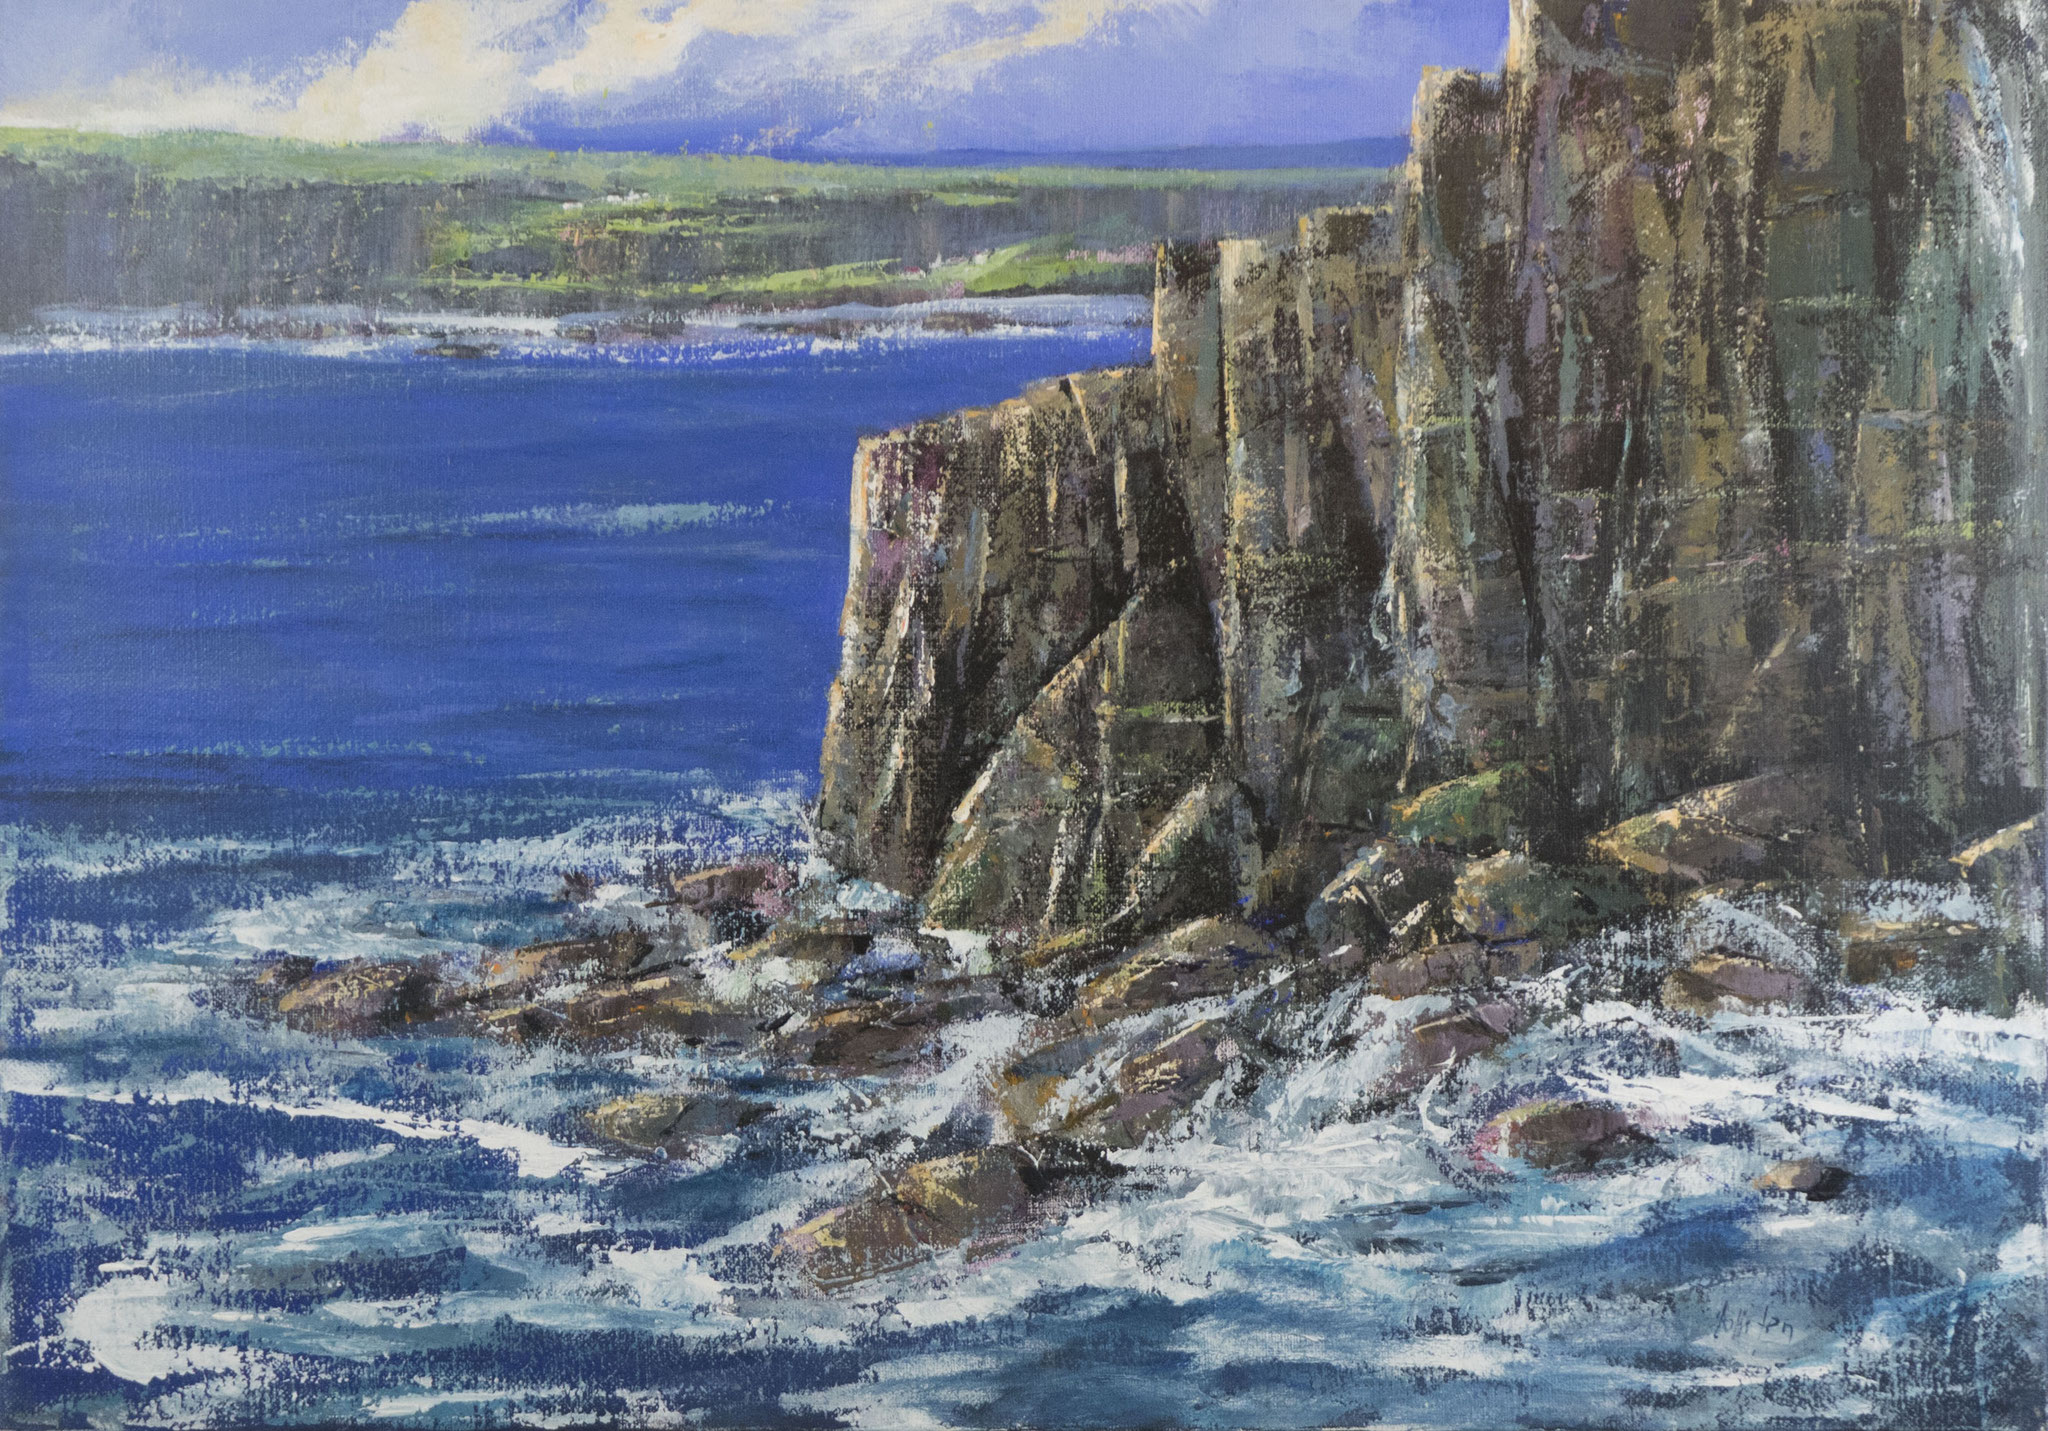 """Dingle Peninsula"" 2008 - Öl auf Leinwand - 100x70 cm"